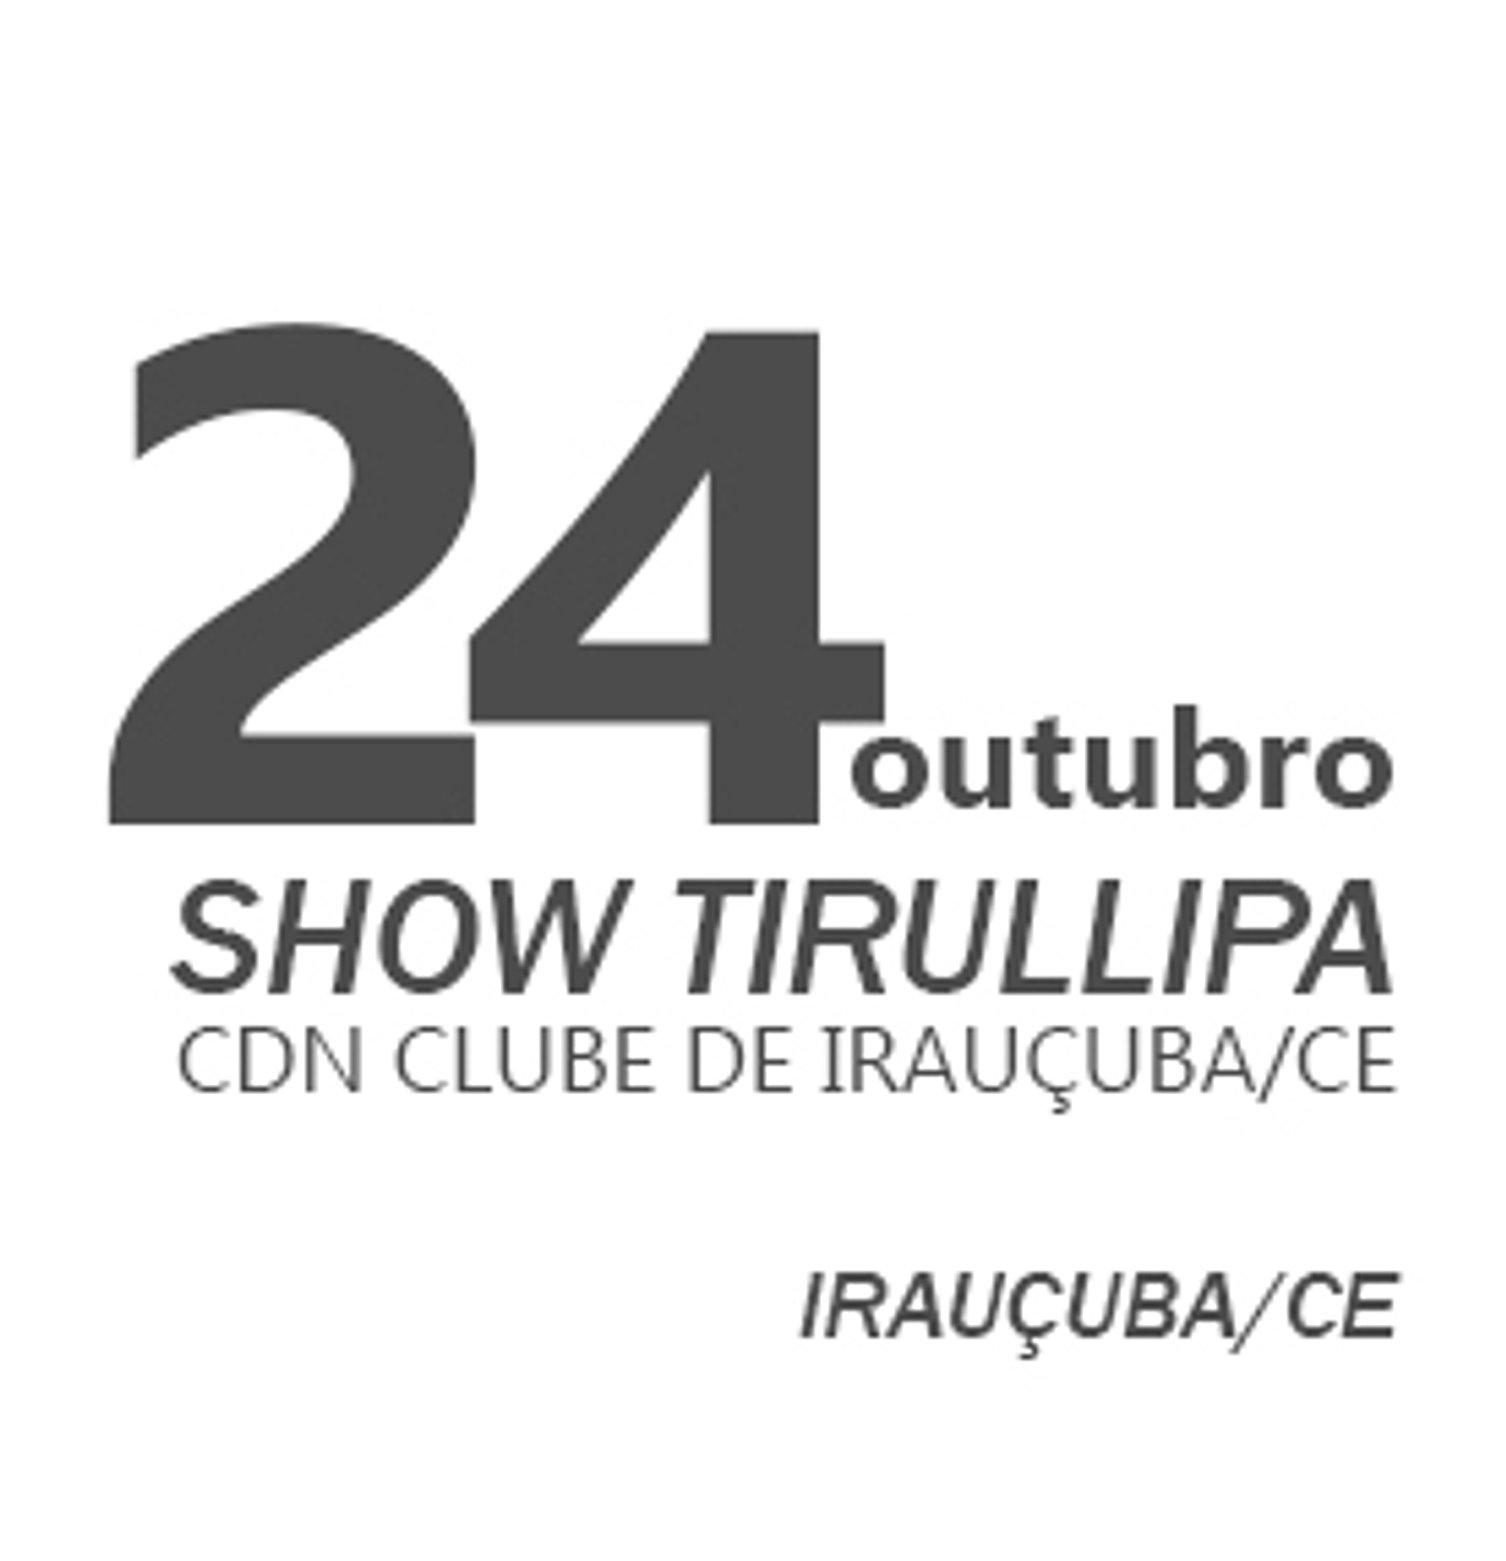 TIRULLIPA EM IRAUÇUBA/CE